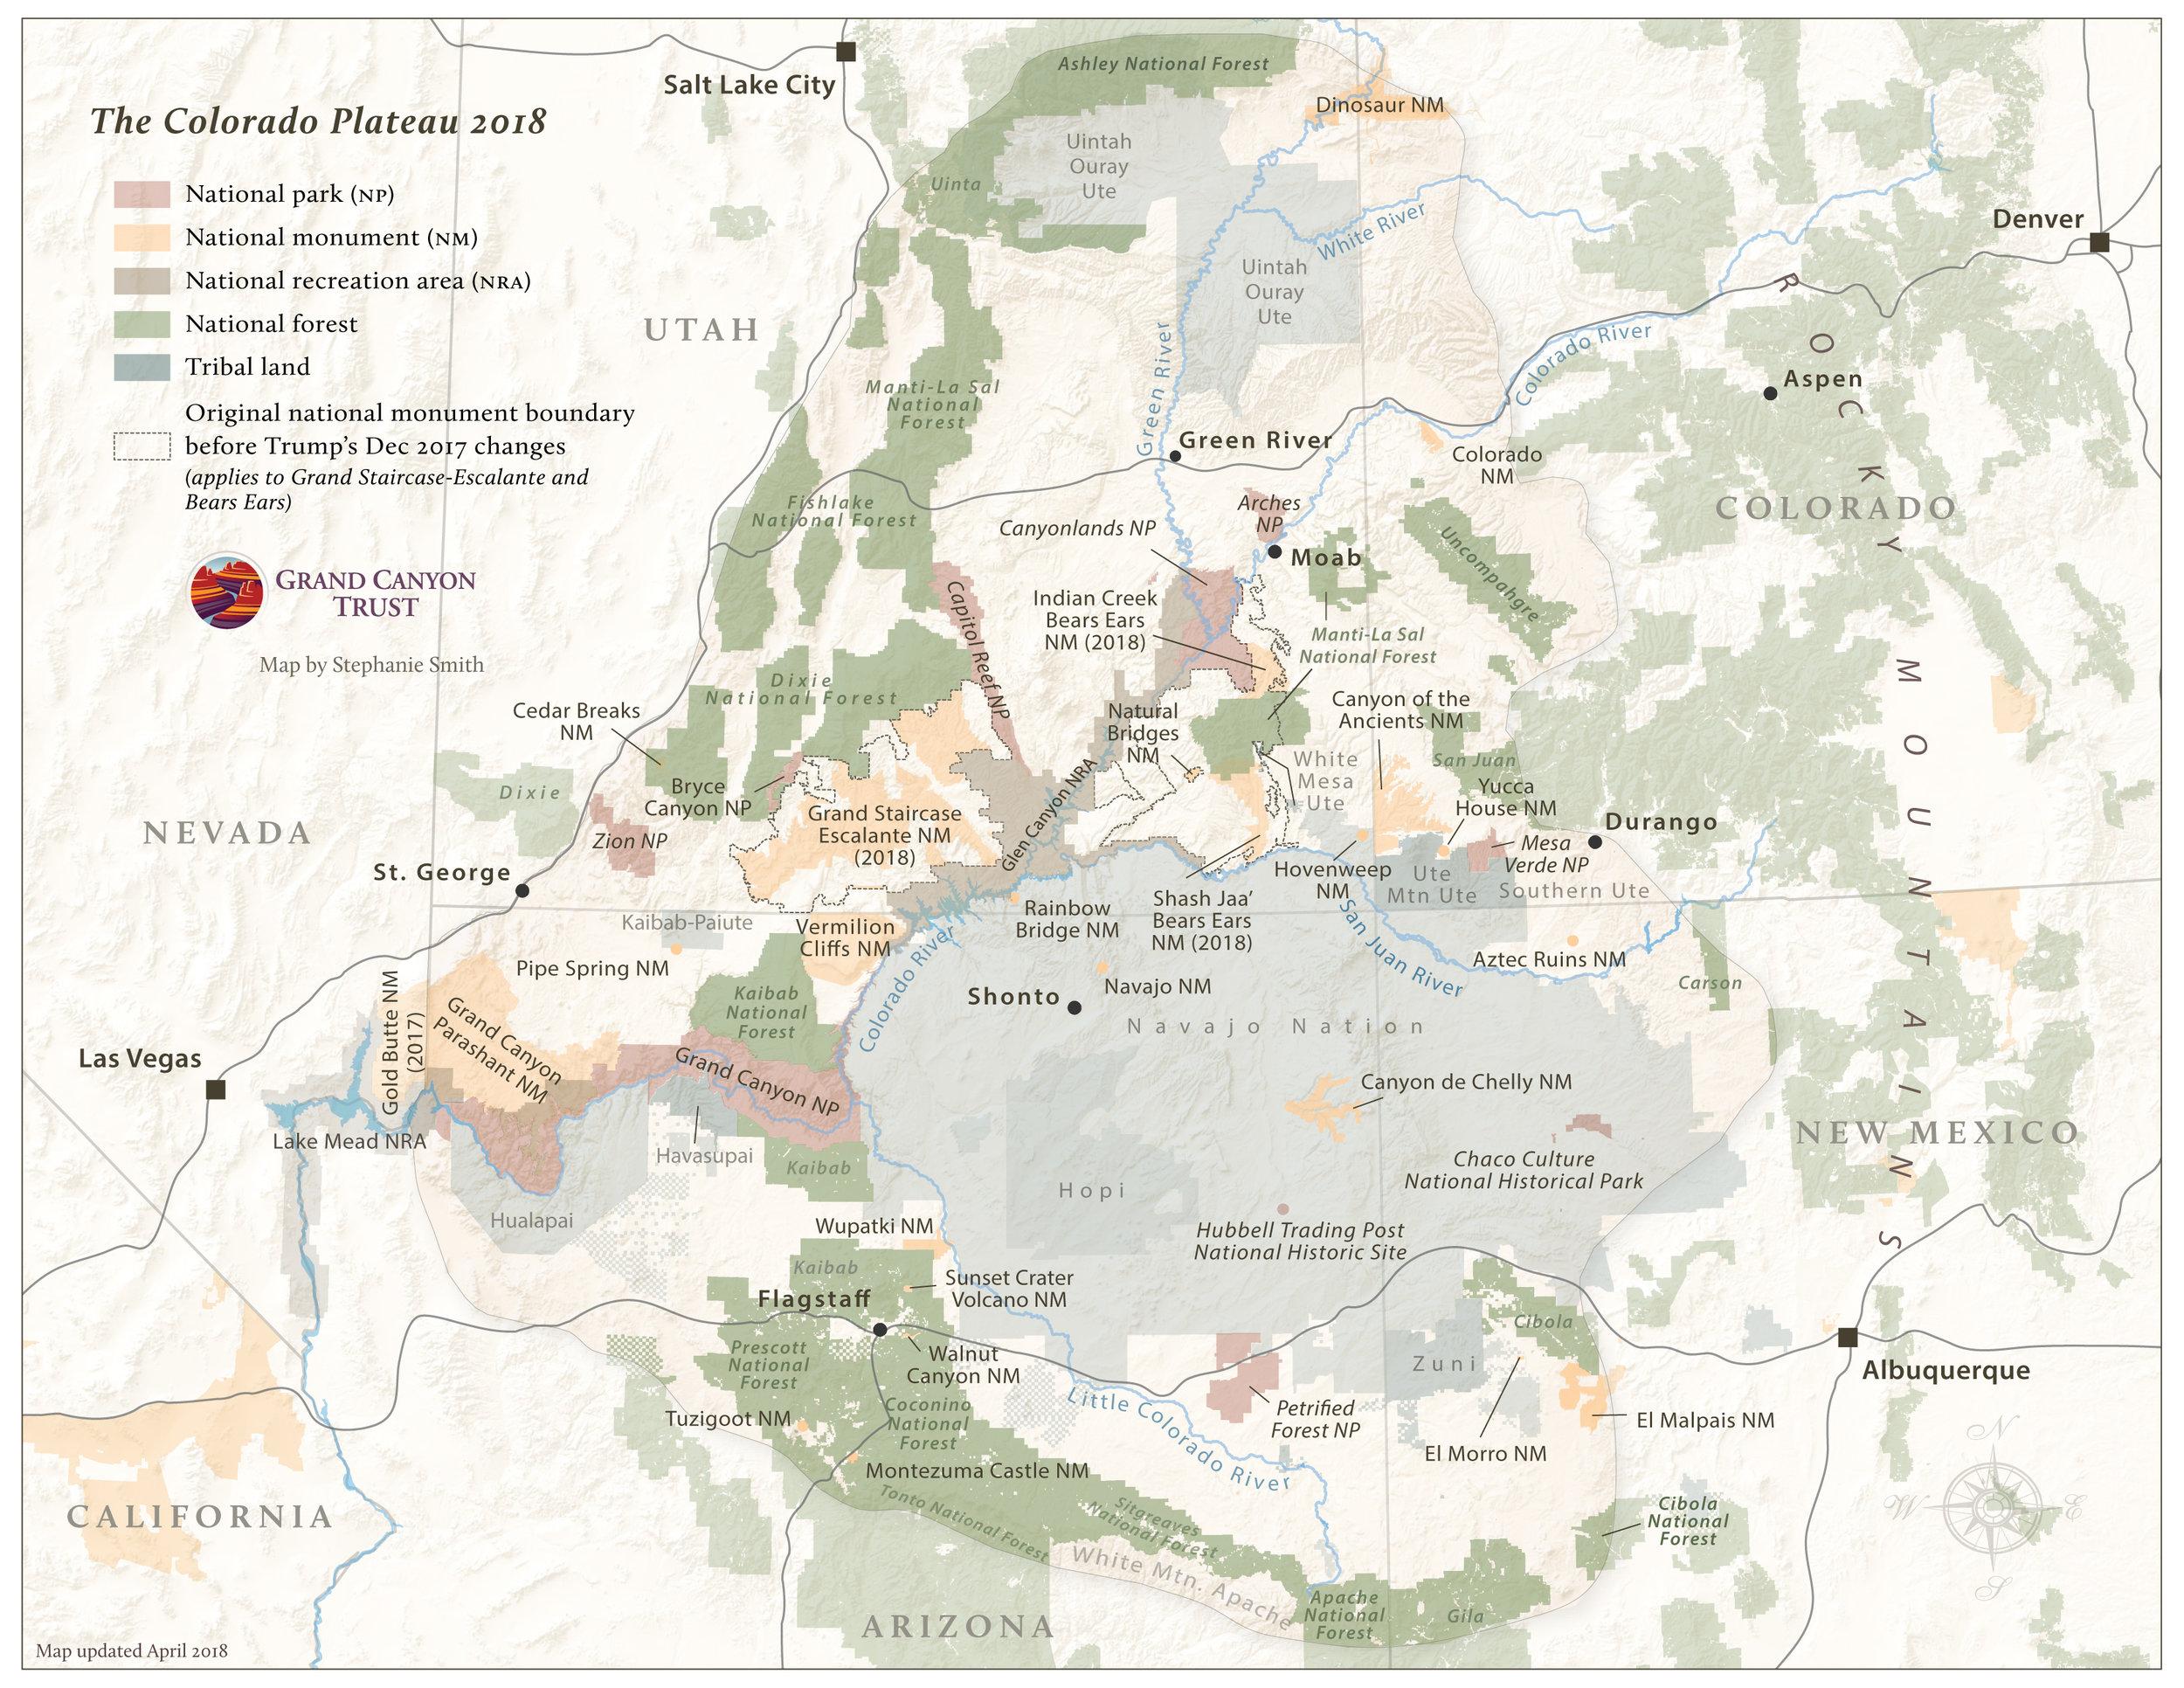 map_colorado_plateau_2018.jpg